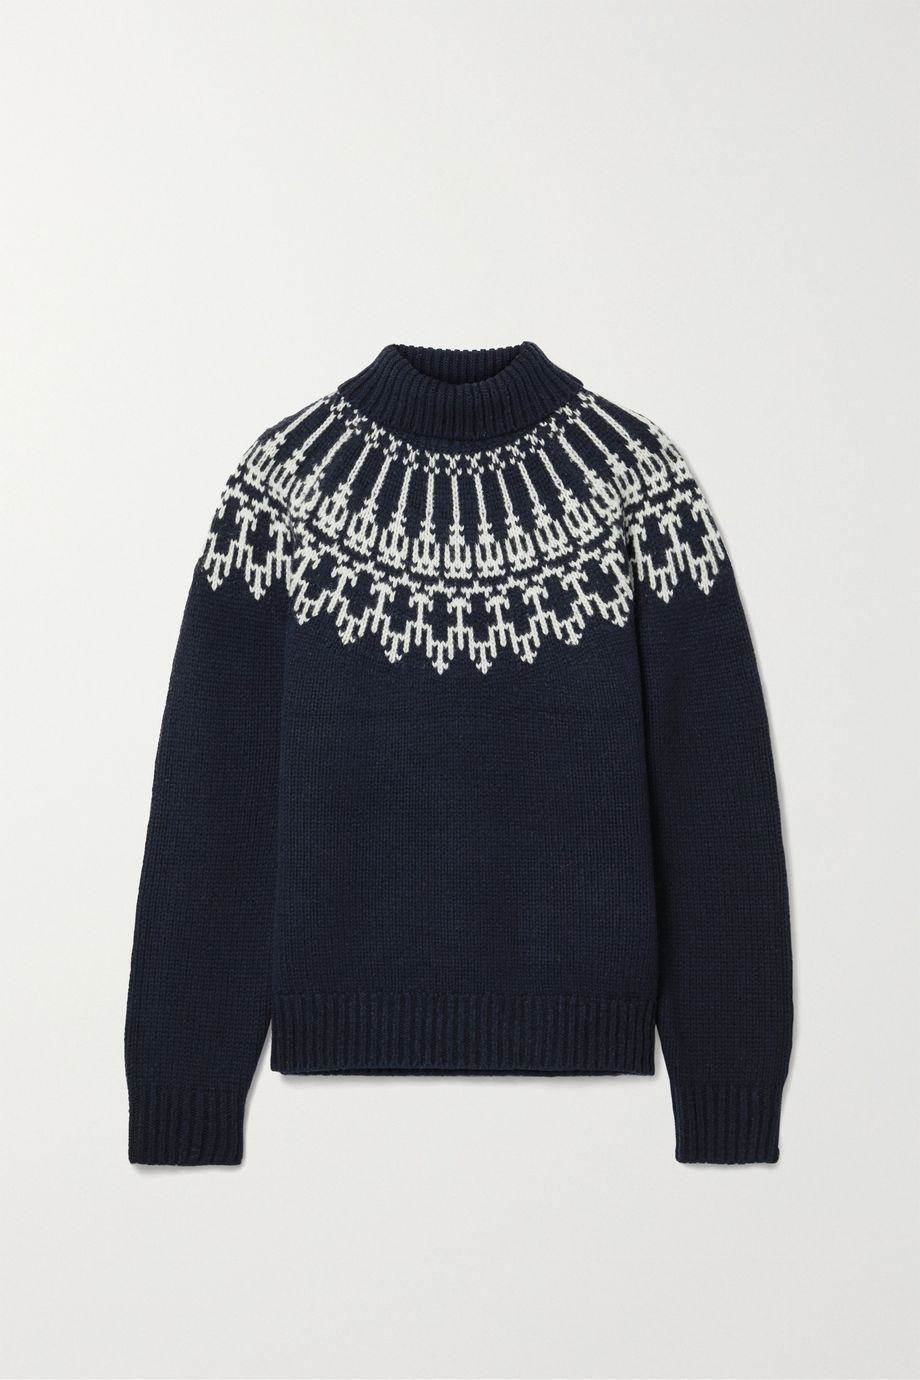 Tory Sport 费尔岛式杂色图案羊毛毛衣